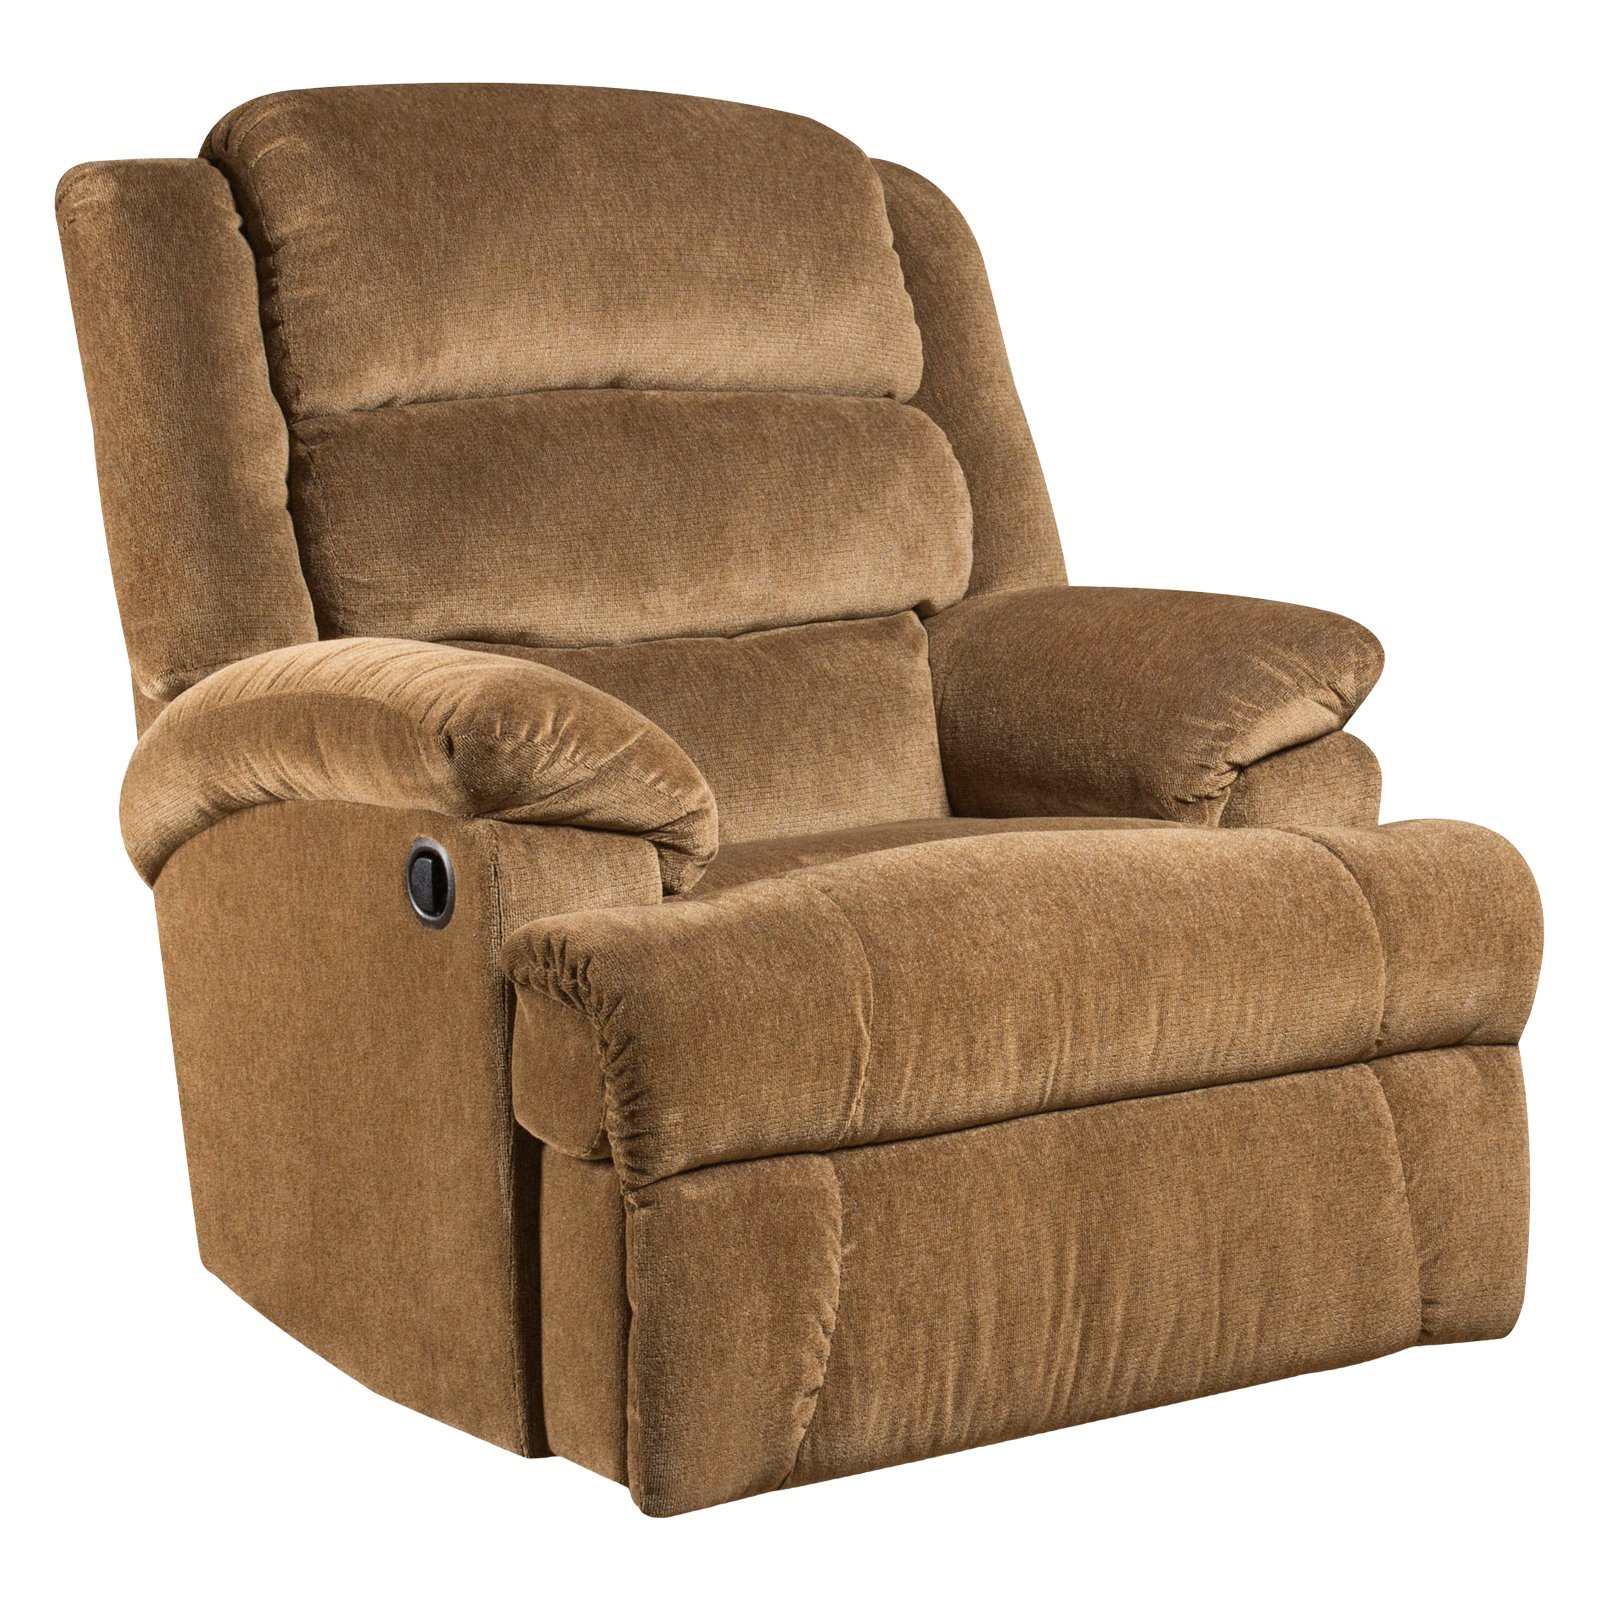 Flash Furniture Big and Tall 350 lb Capacity Aynsley Microfiber Recliner, Multiple Colors